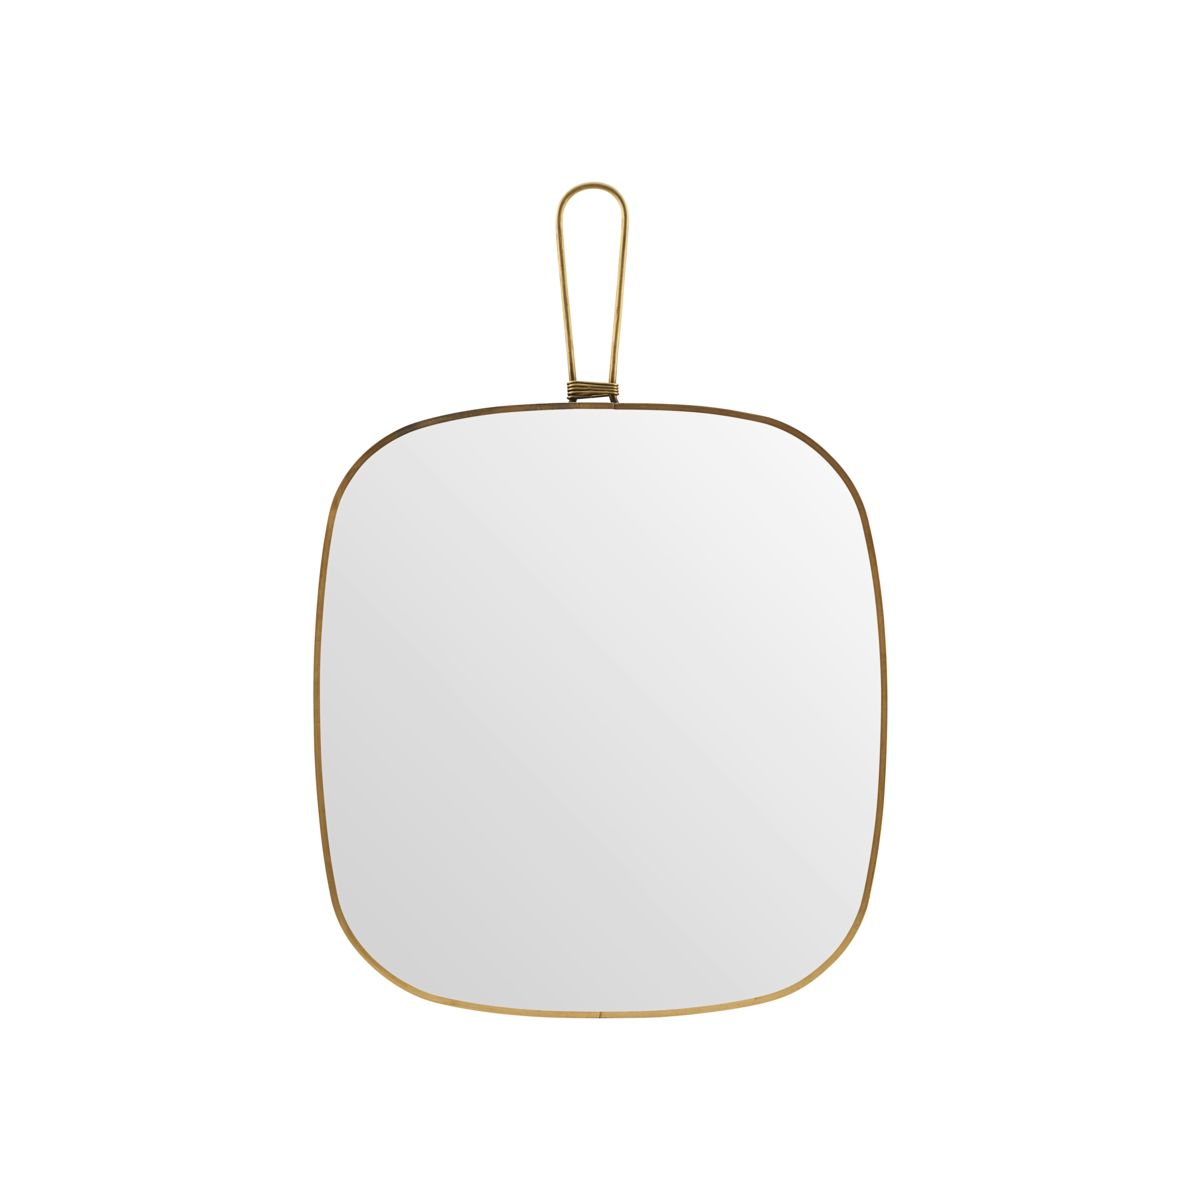 Køb Meraki Spejl Med Ramme 26×28 – Antik Messing